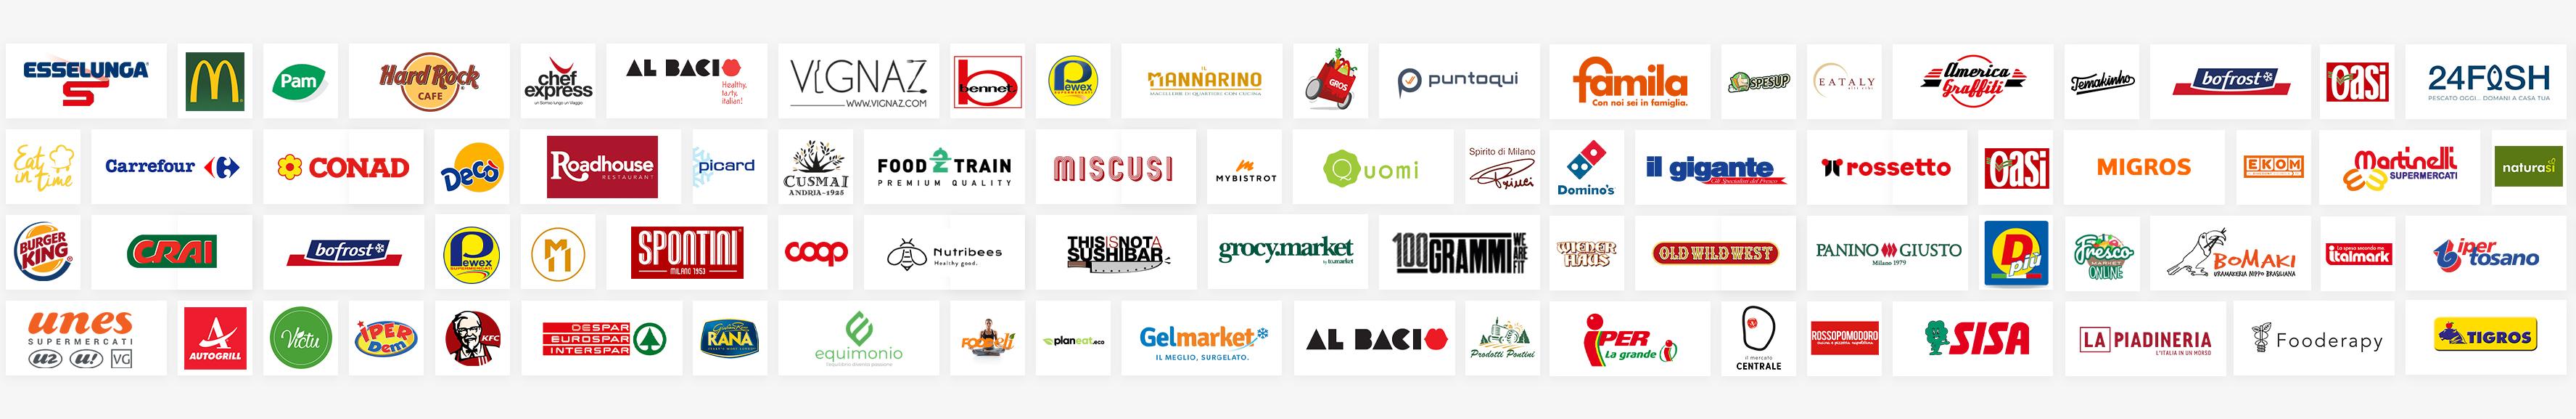 buono-pasto-ticket-restaurant-logowall-full-digital-202110